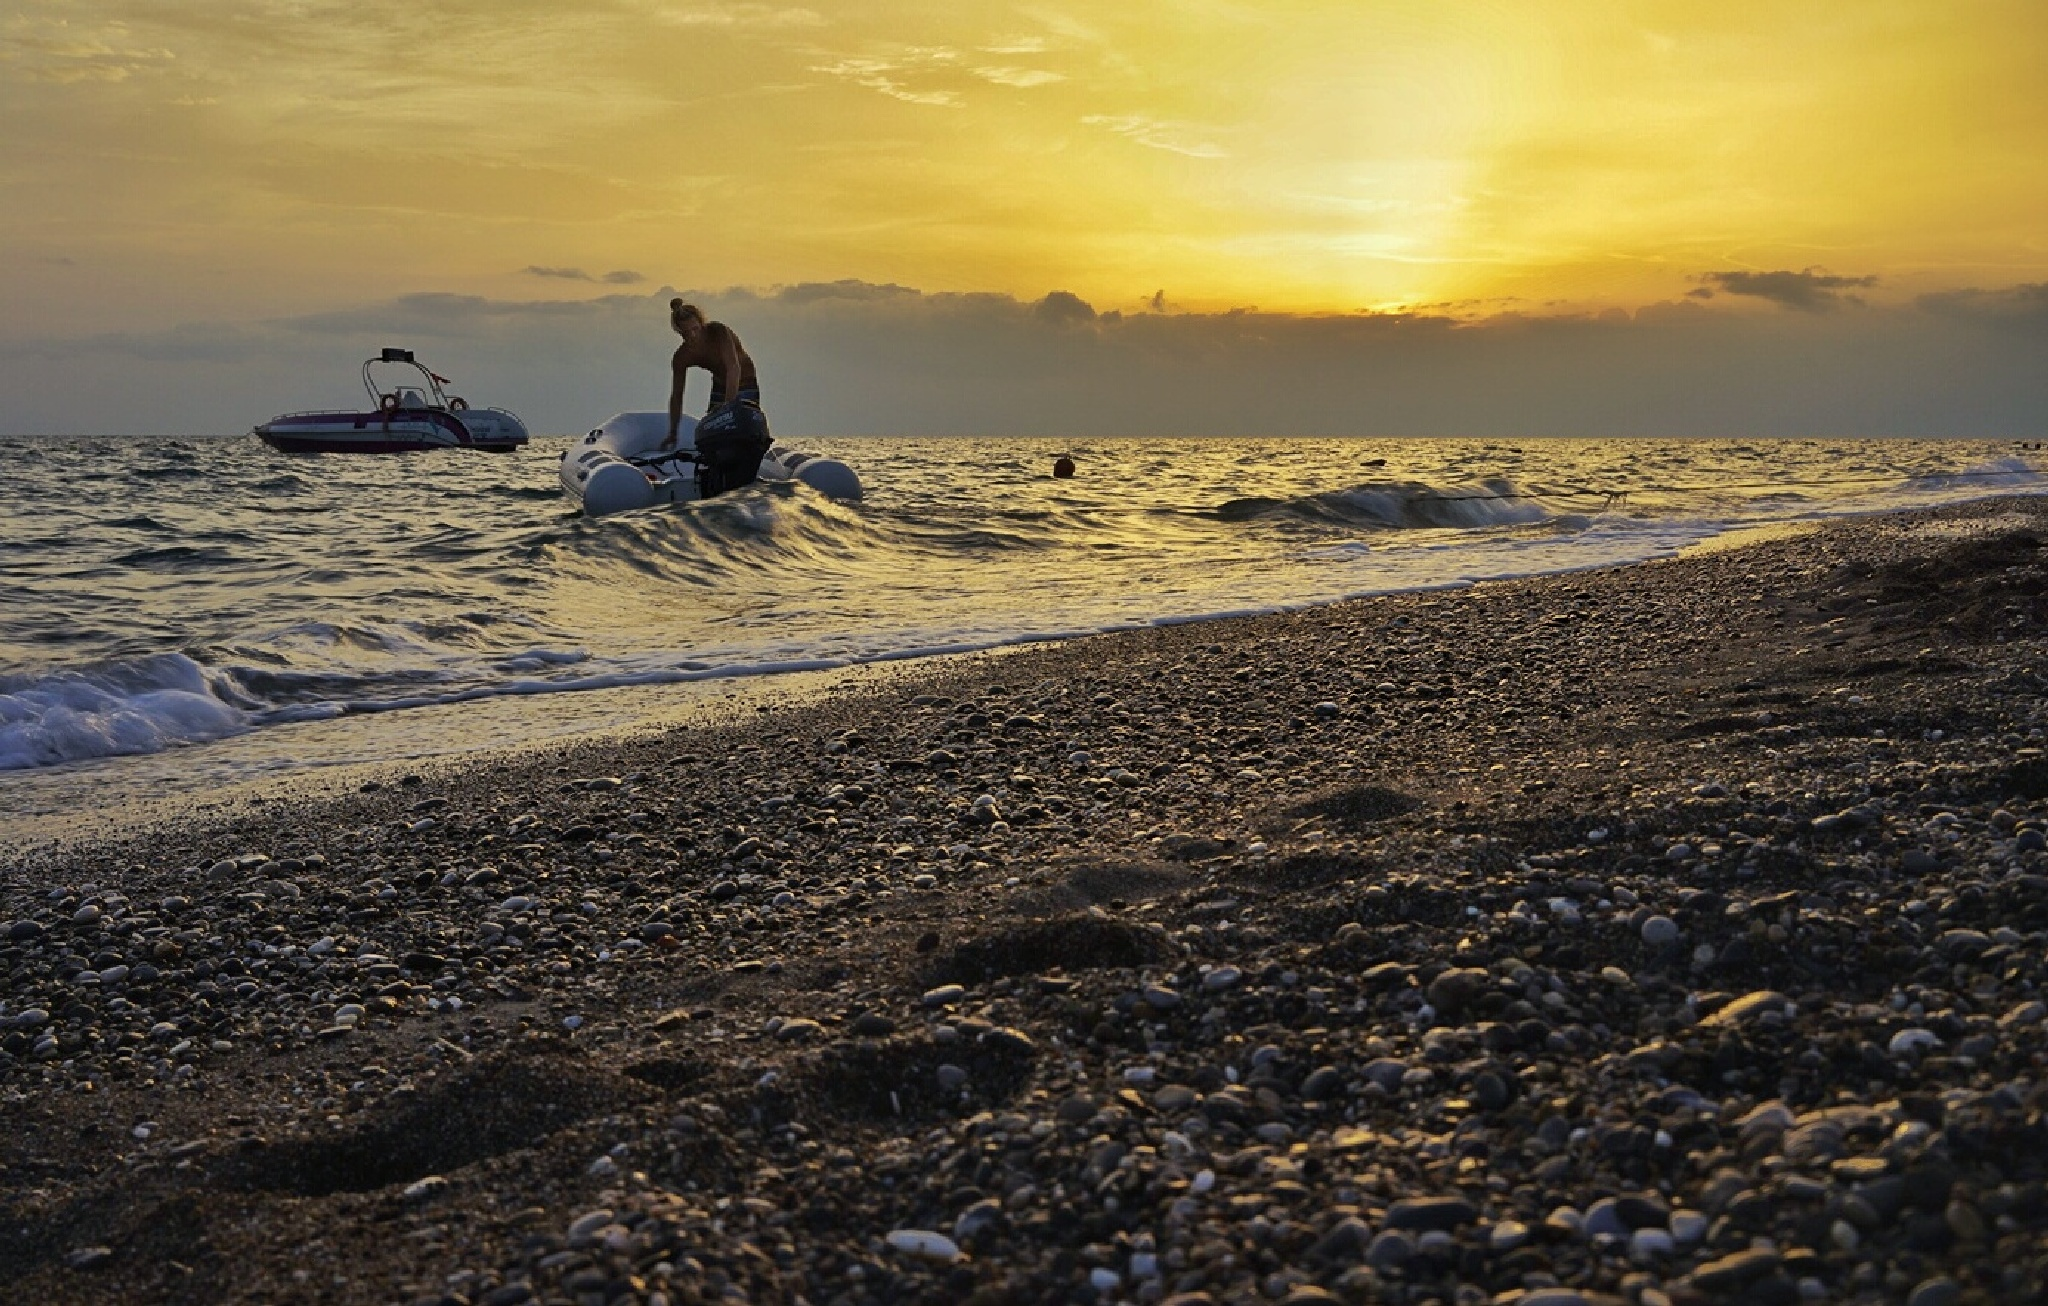 Sunset in Turkey  by marian ciubotaru